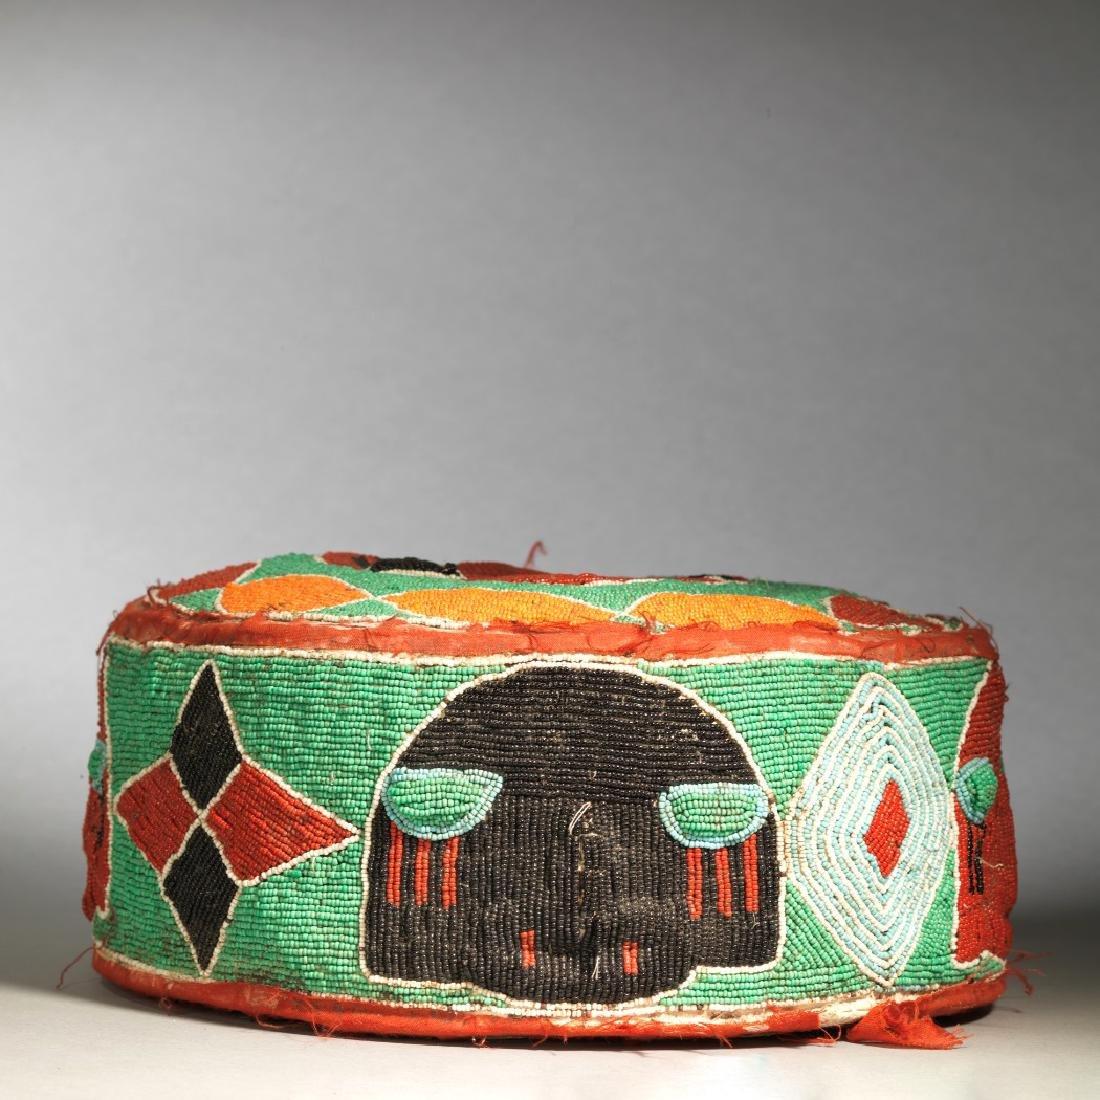 Yoruba Royal Foot Cushion Tribal Art - 4